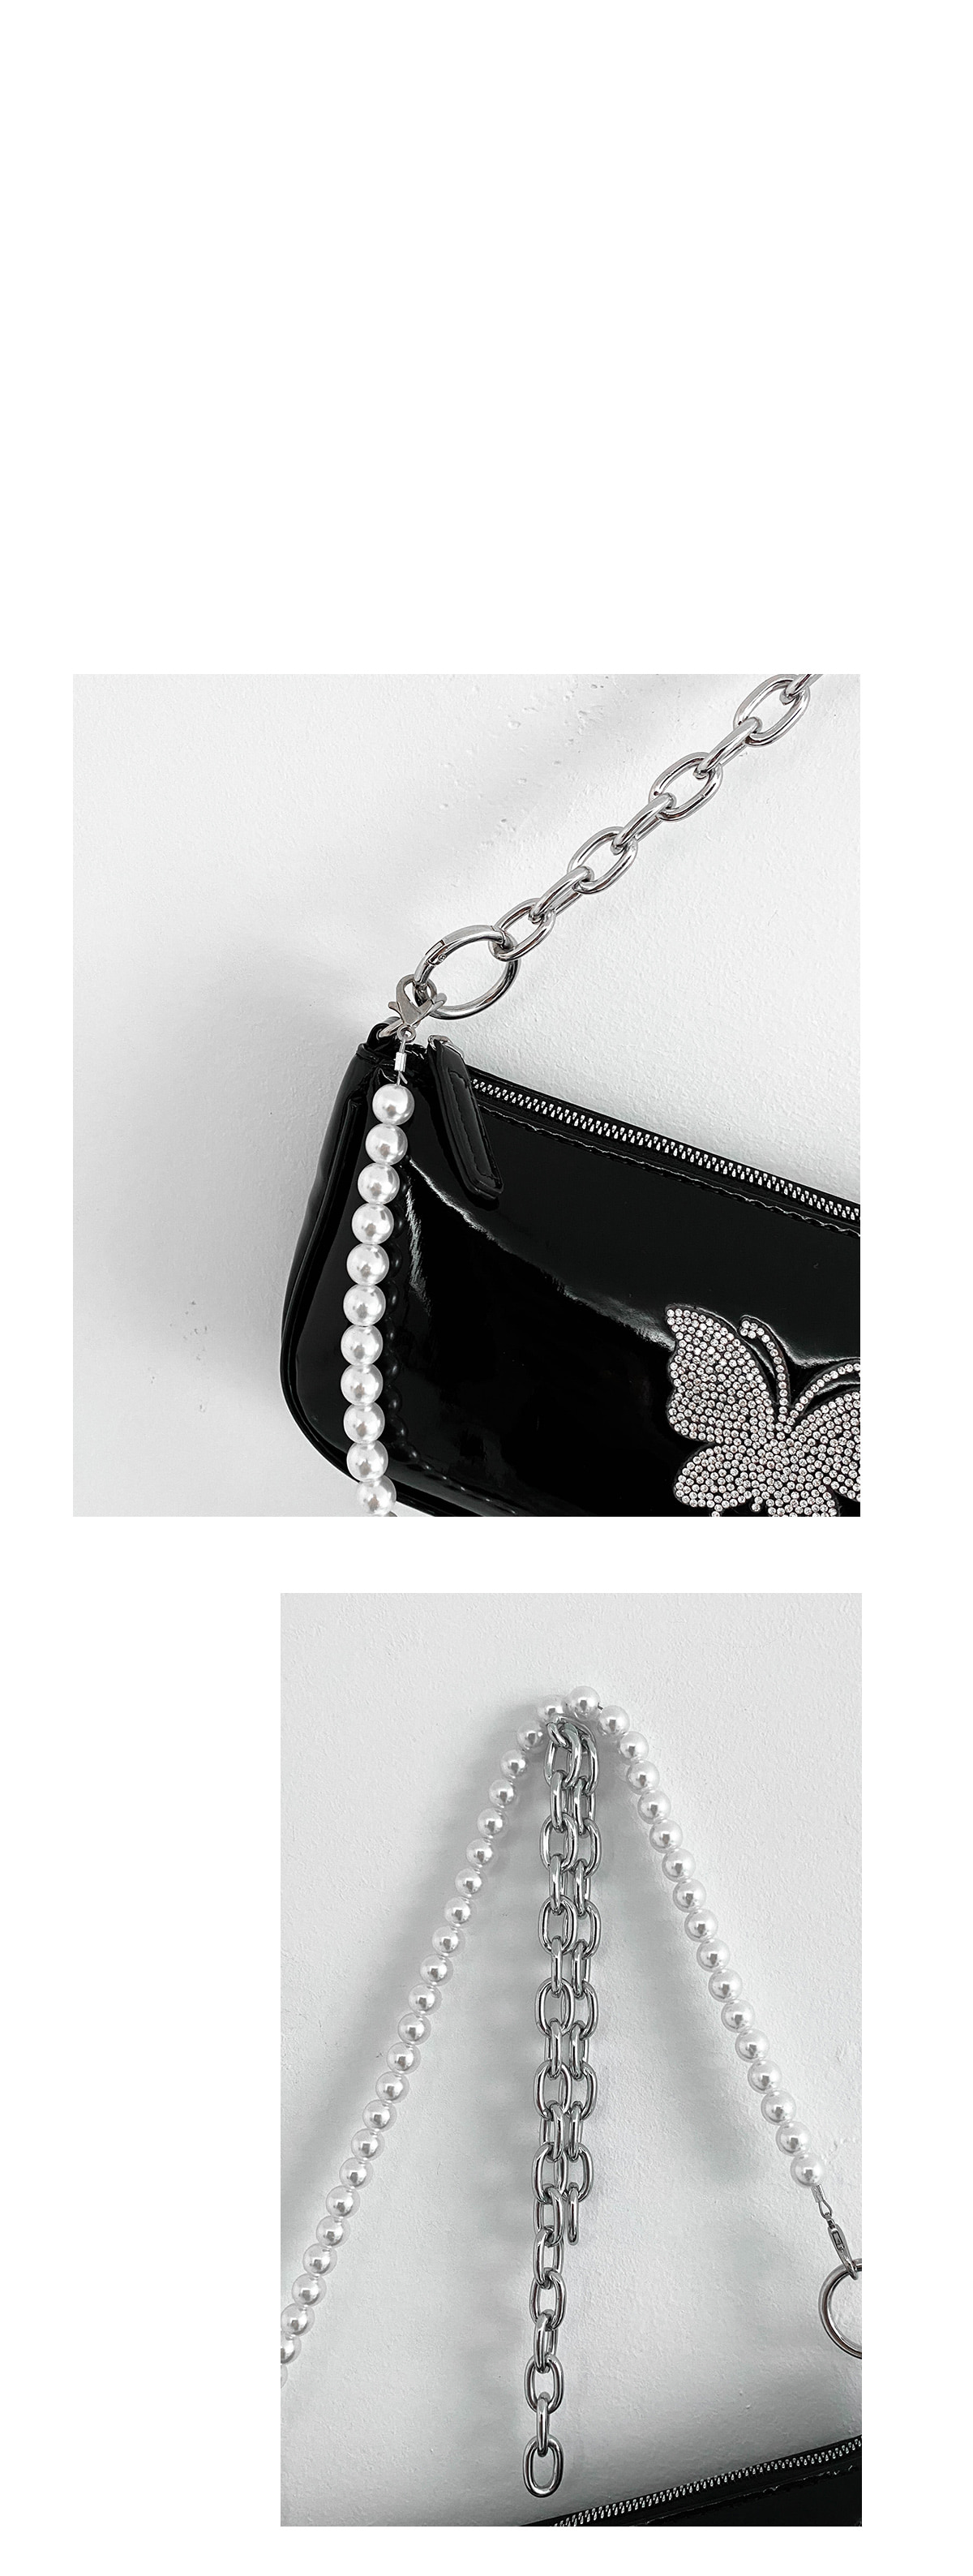 Butterfly pearl shoulder bag